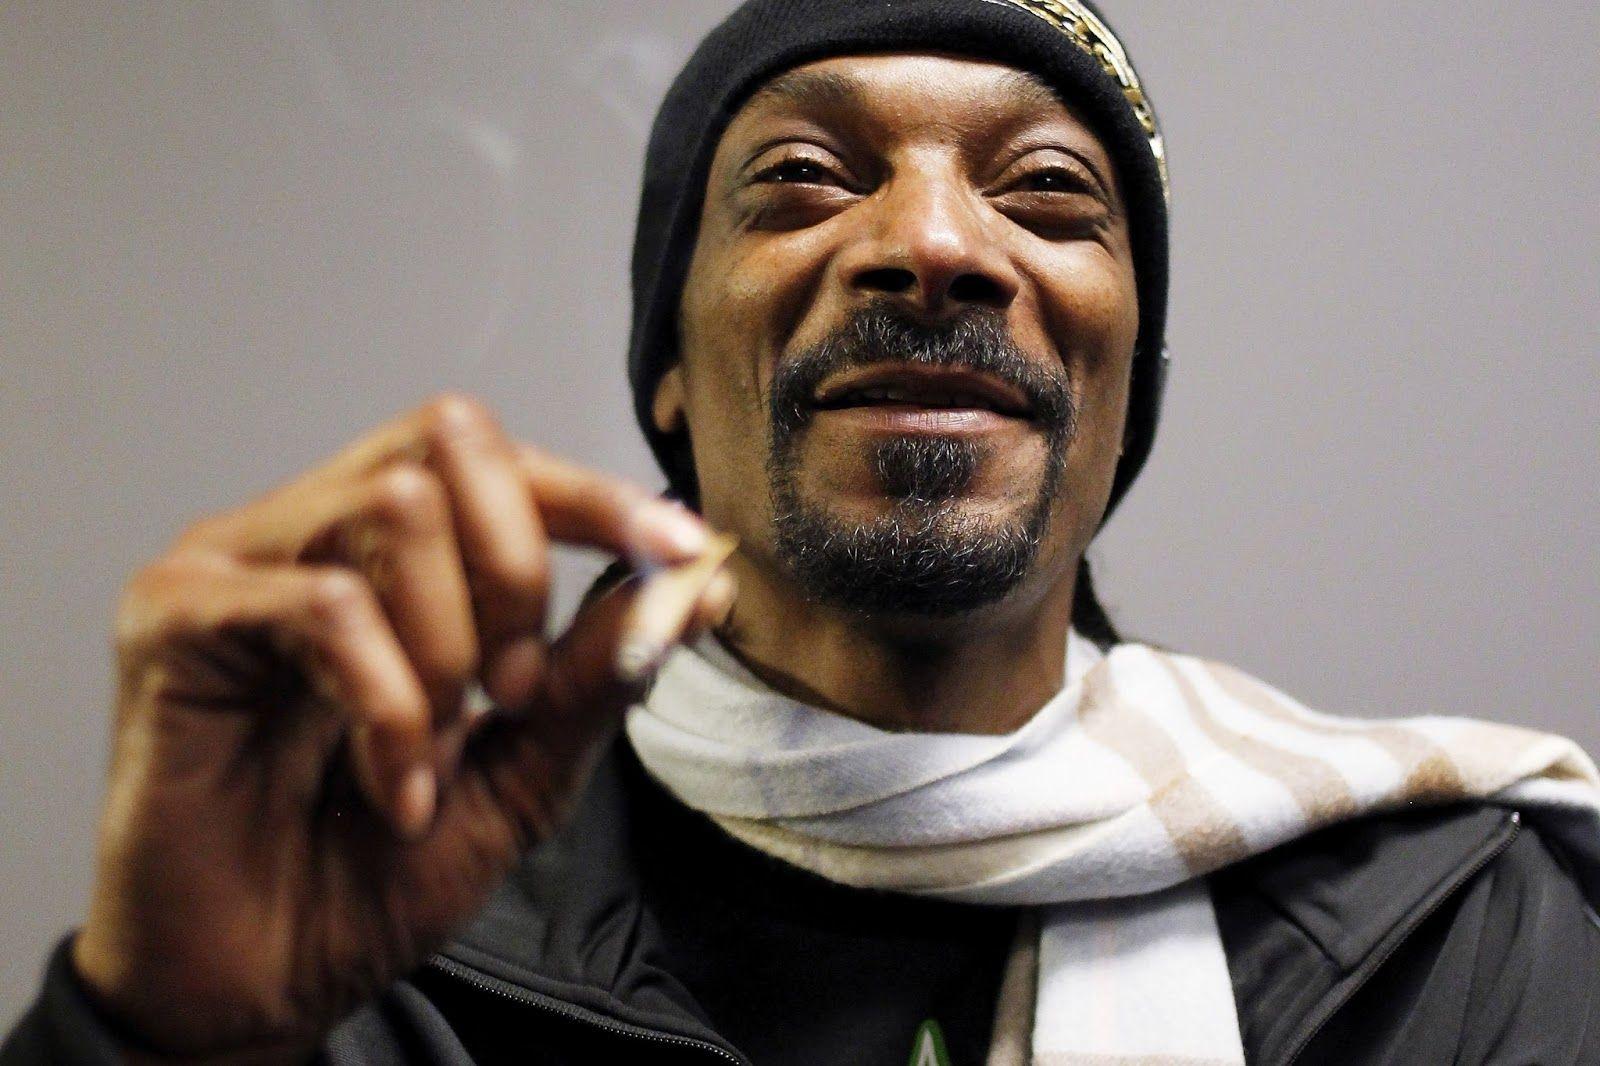 ACKCITY NEWS: Snoop Dogg (Snoop Lion)